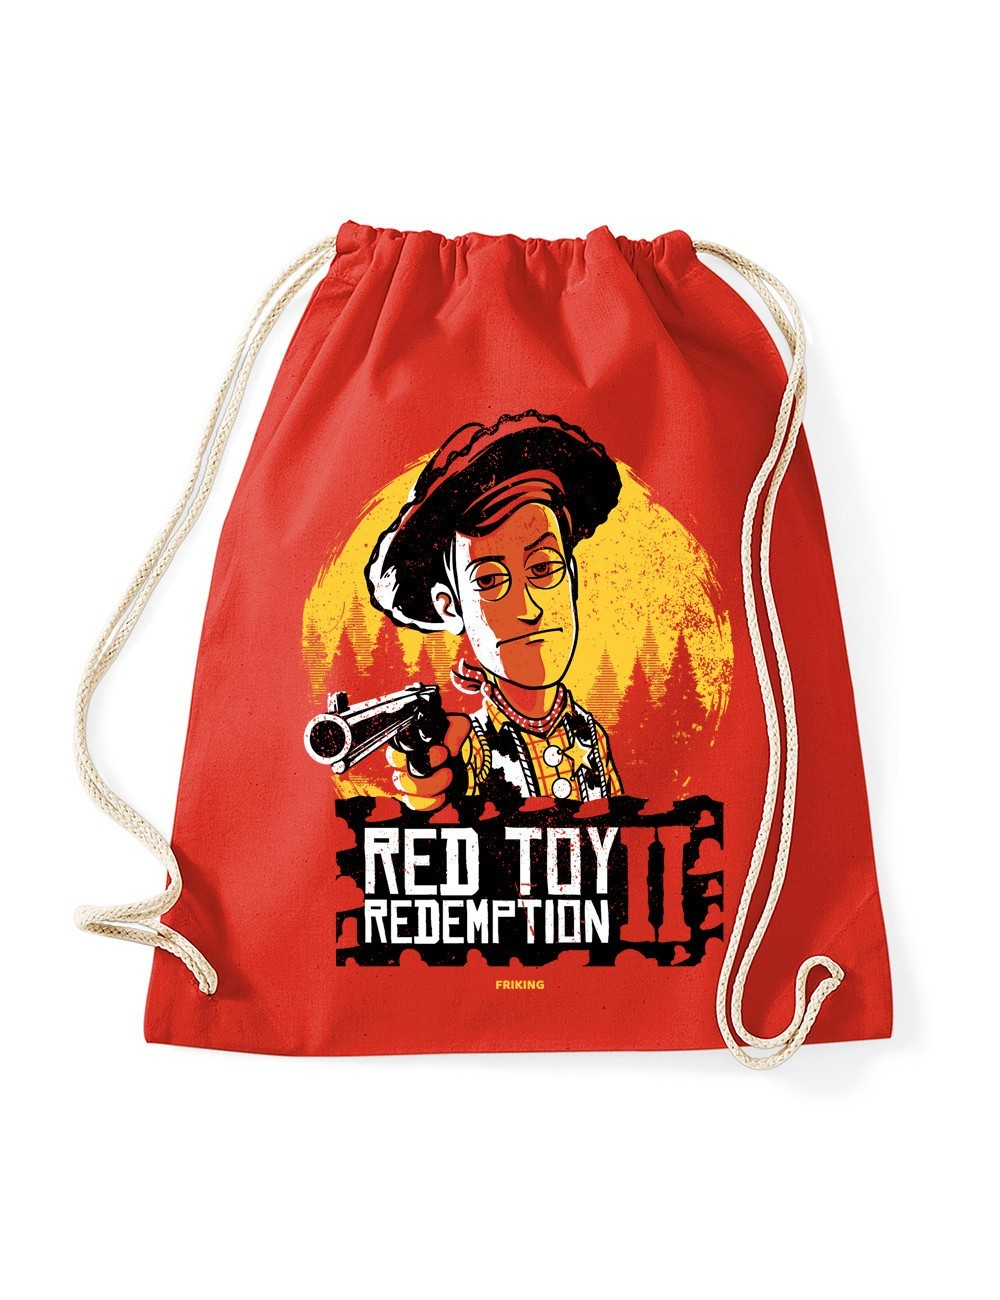 Red toy redemption II